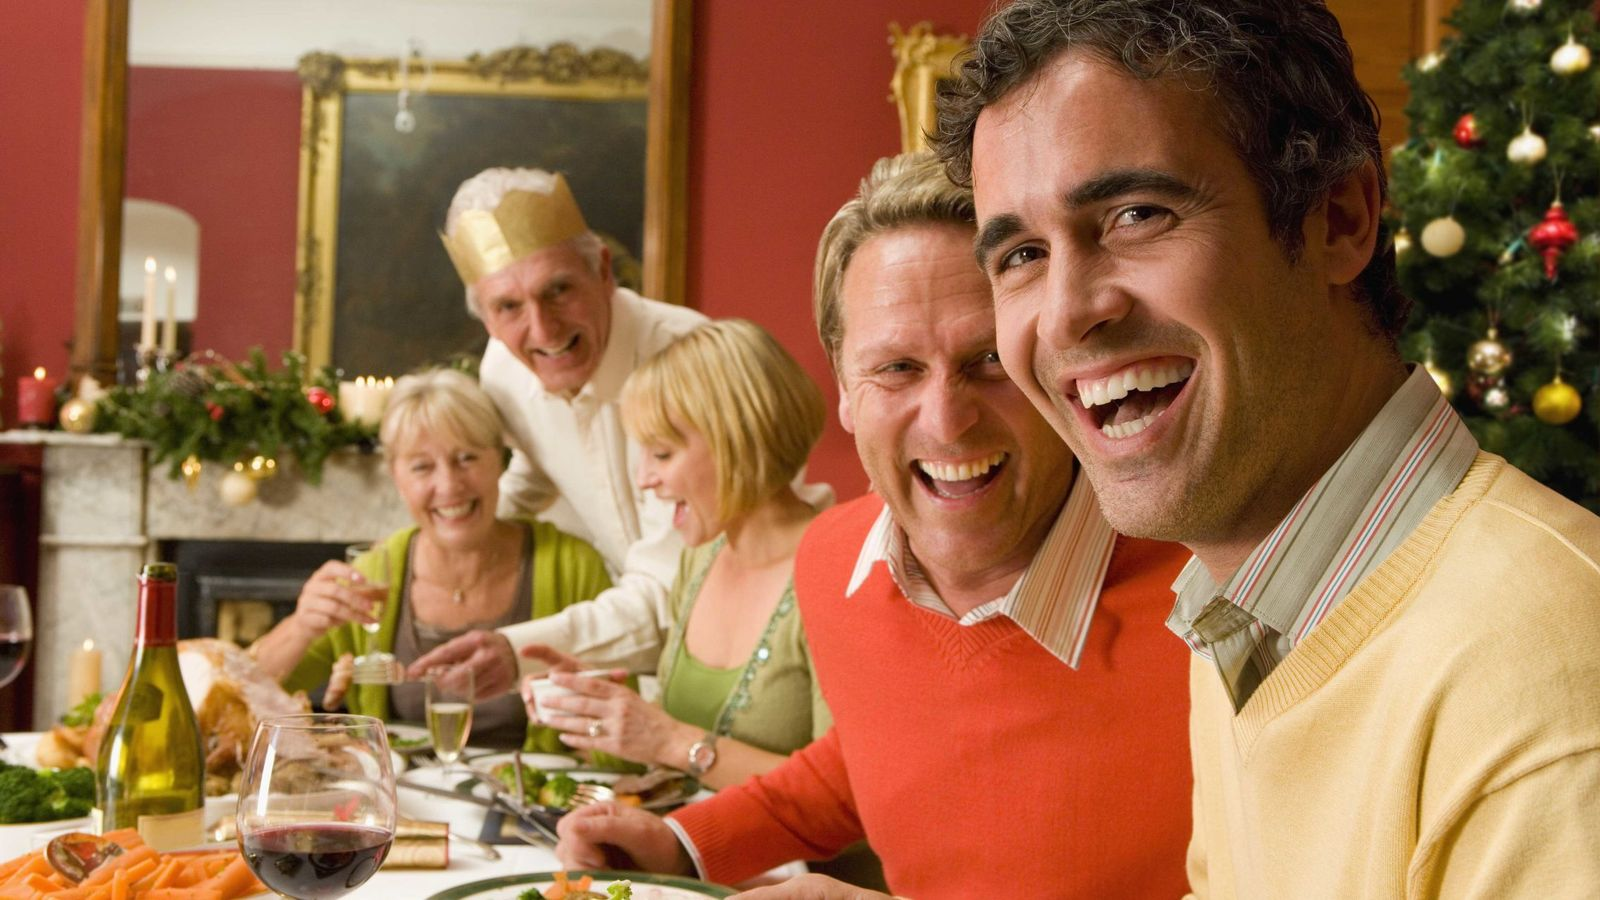 Alimentaci n nochevieja de pesadilla mi familia va a - Cena para noche vieja ...